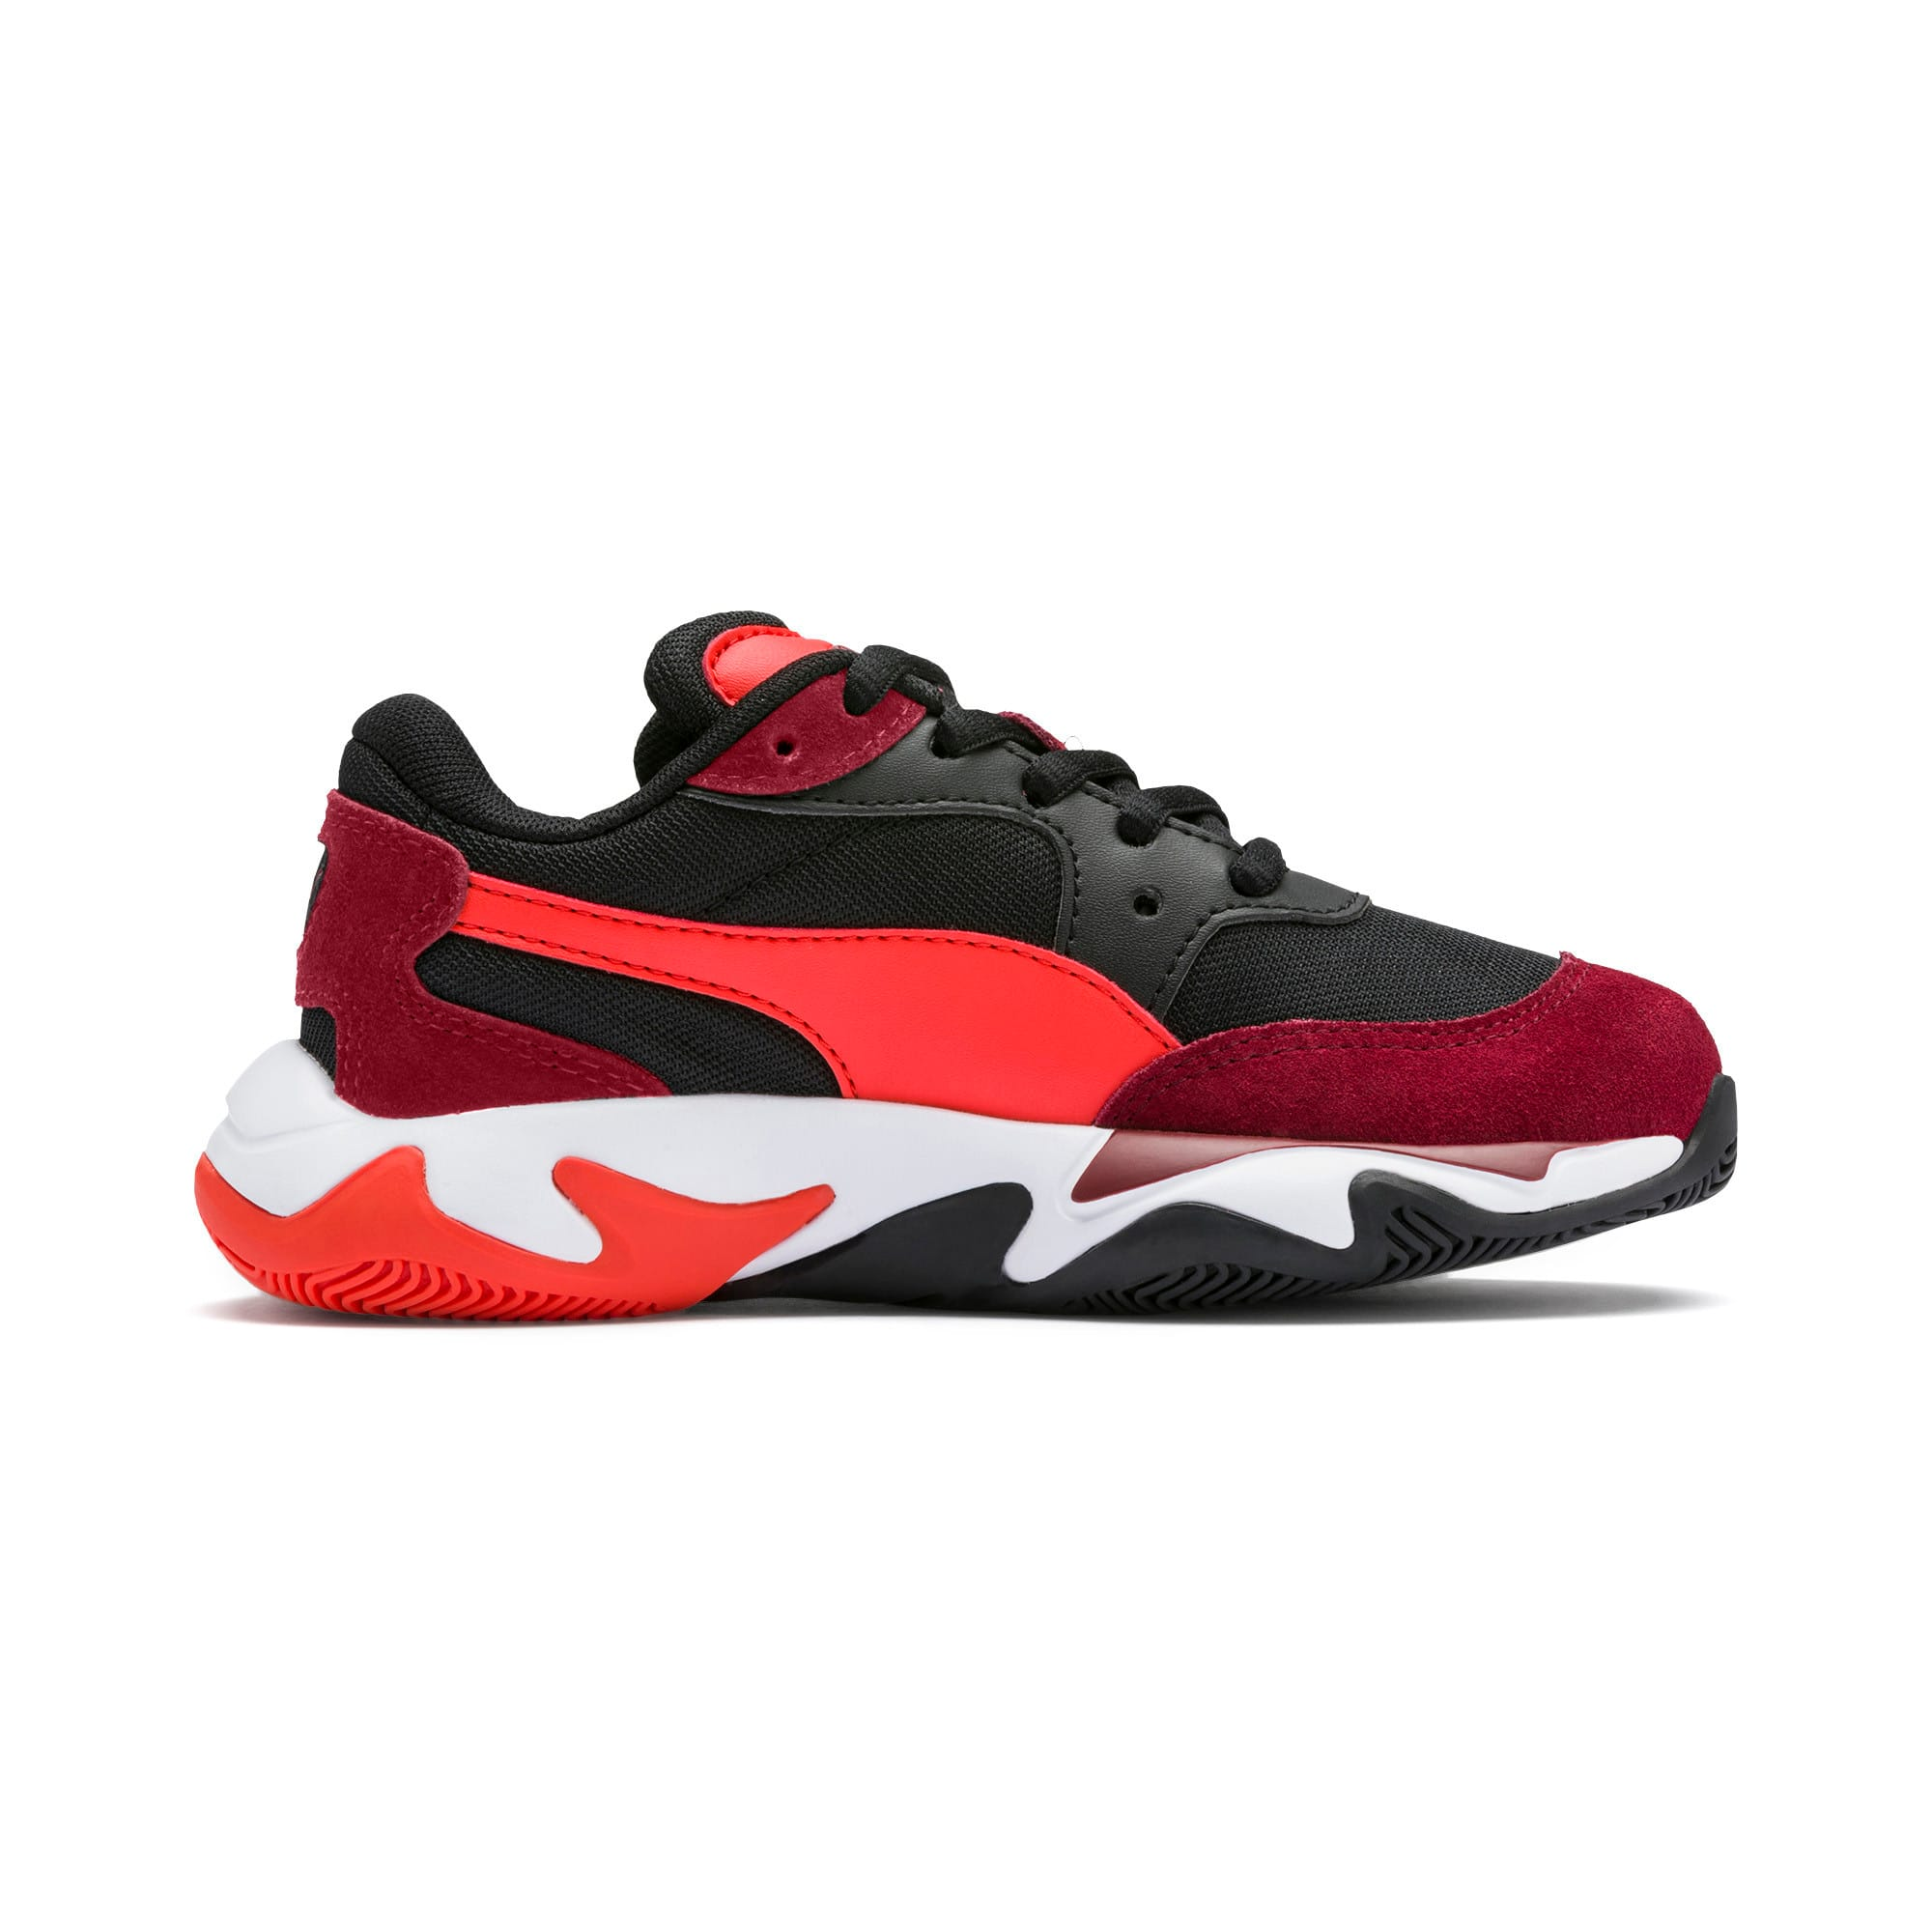 Miniatura 5 de Zapatos Storm Ray para niño pequeño, Rhubarb-Puma Black, mediano